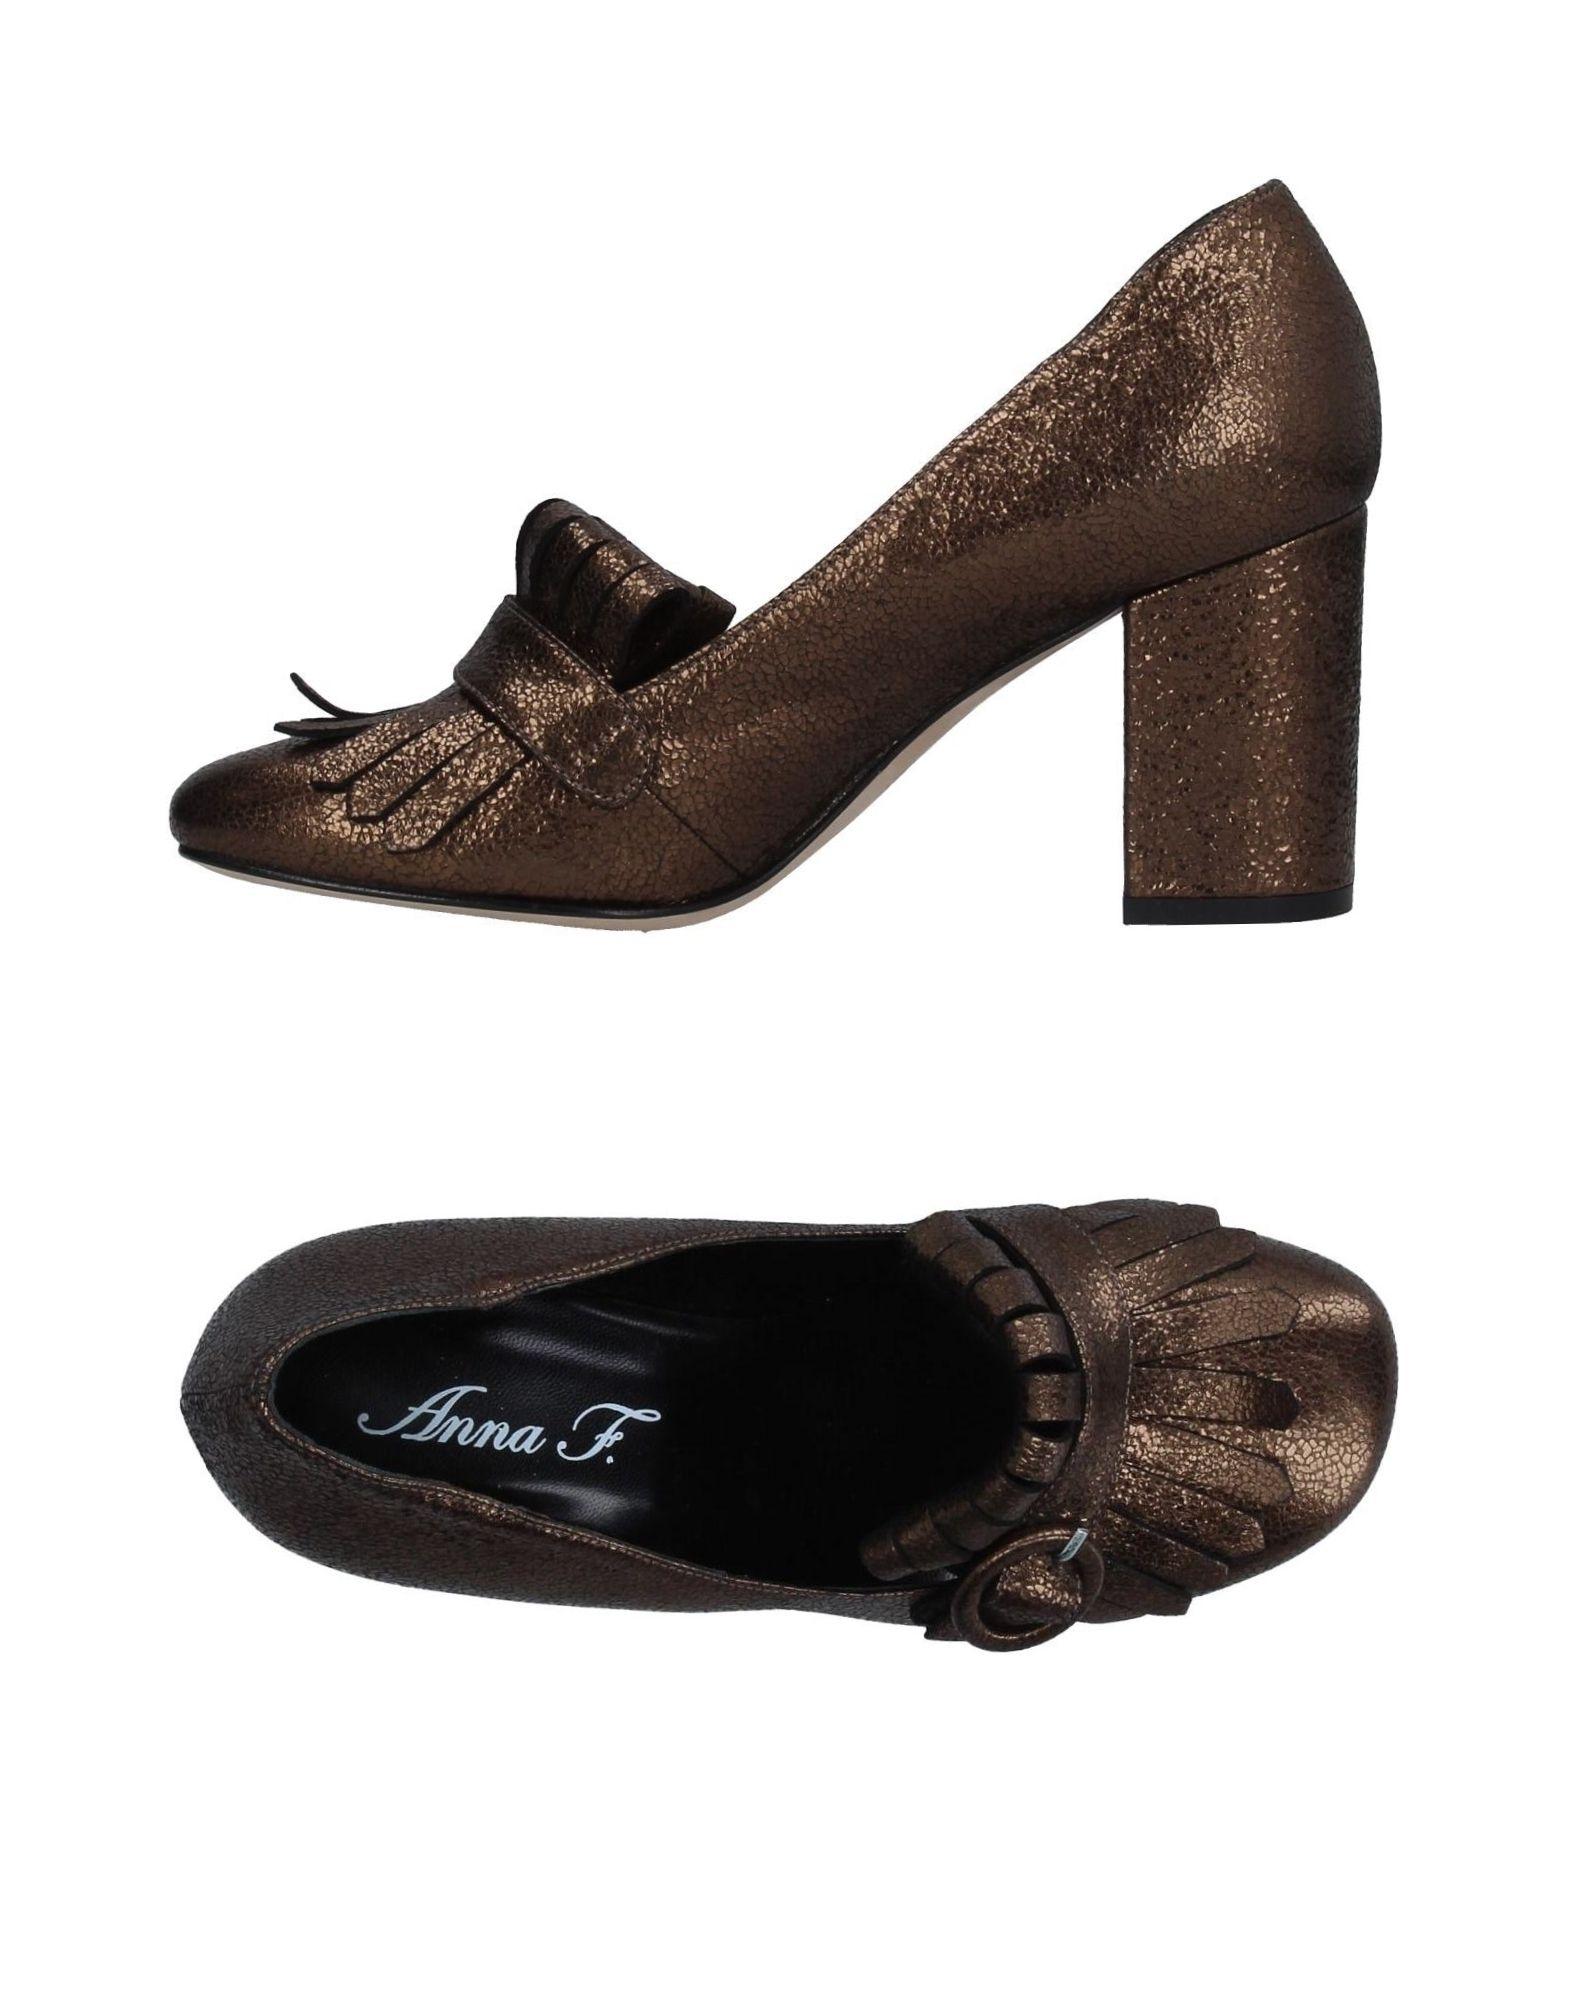 Anna F. Mokassins Damen  11239449EX Gute Qualität beliebte Schuhe